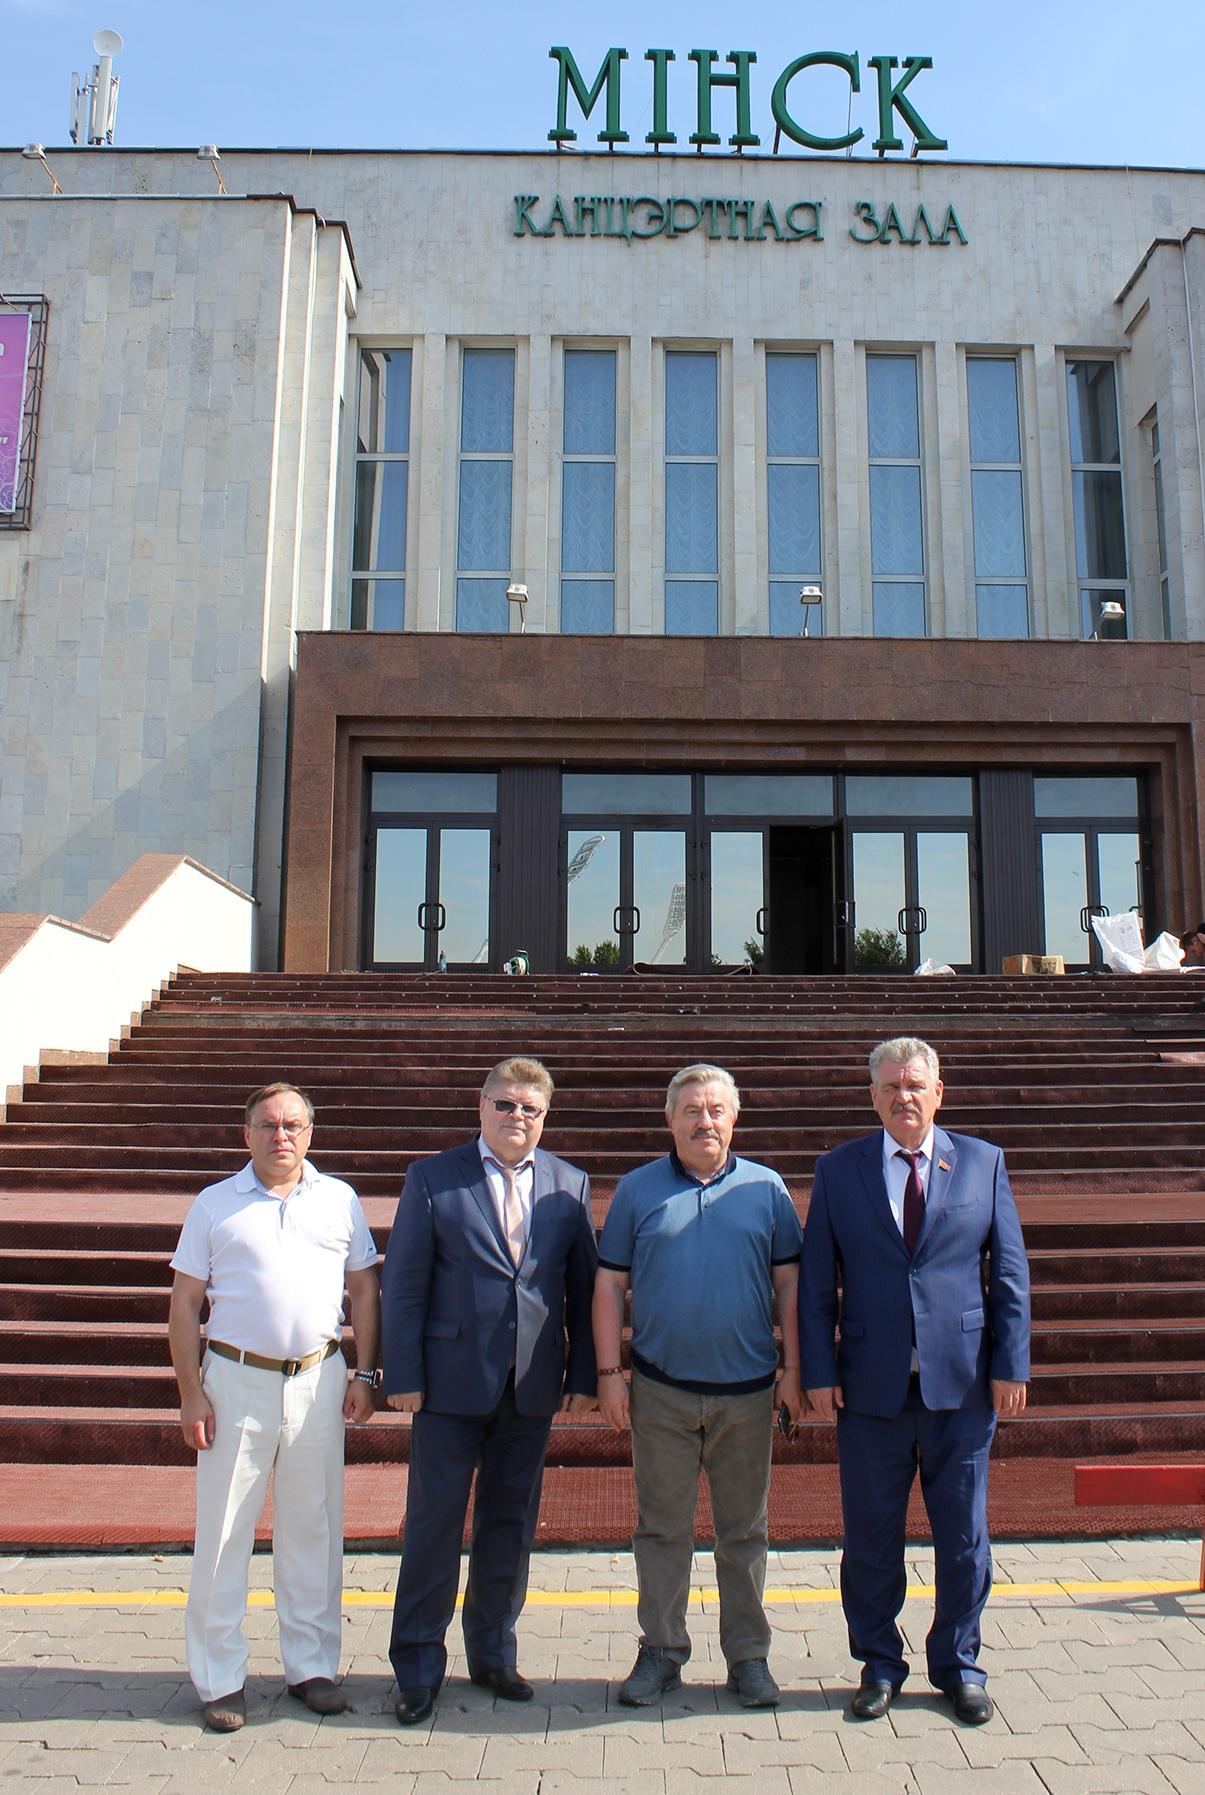 Fra højre mod venstre er N. Ulakhovitj, V. Vodolatskij, L. Makurov